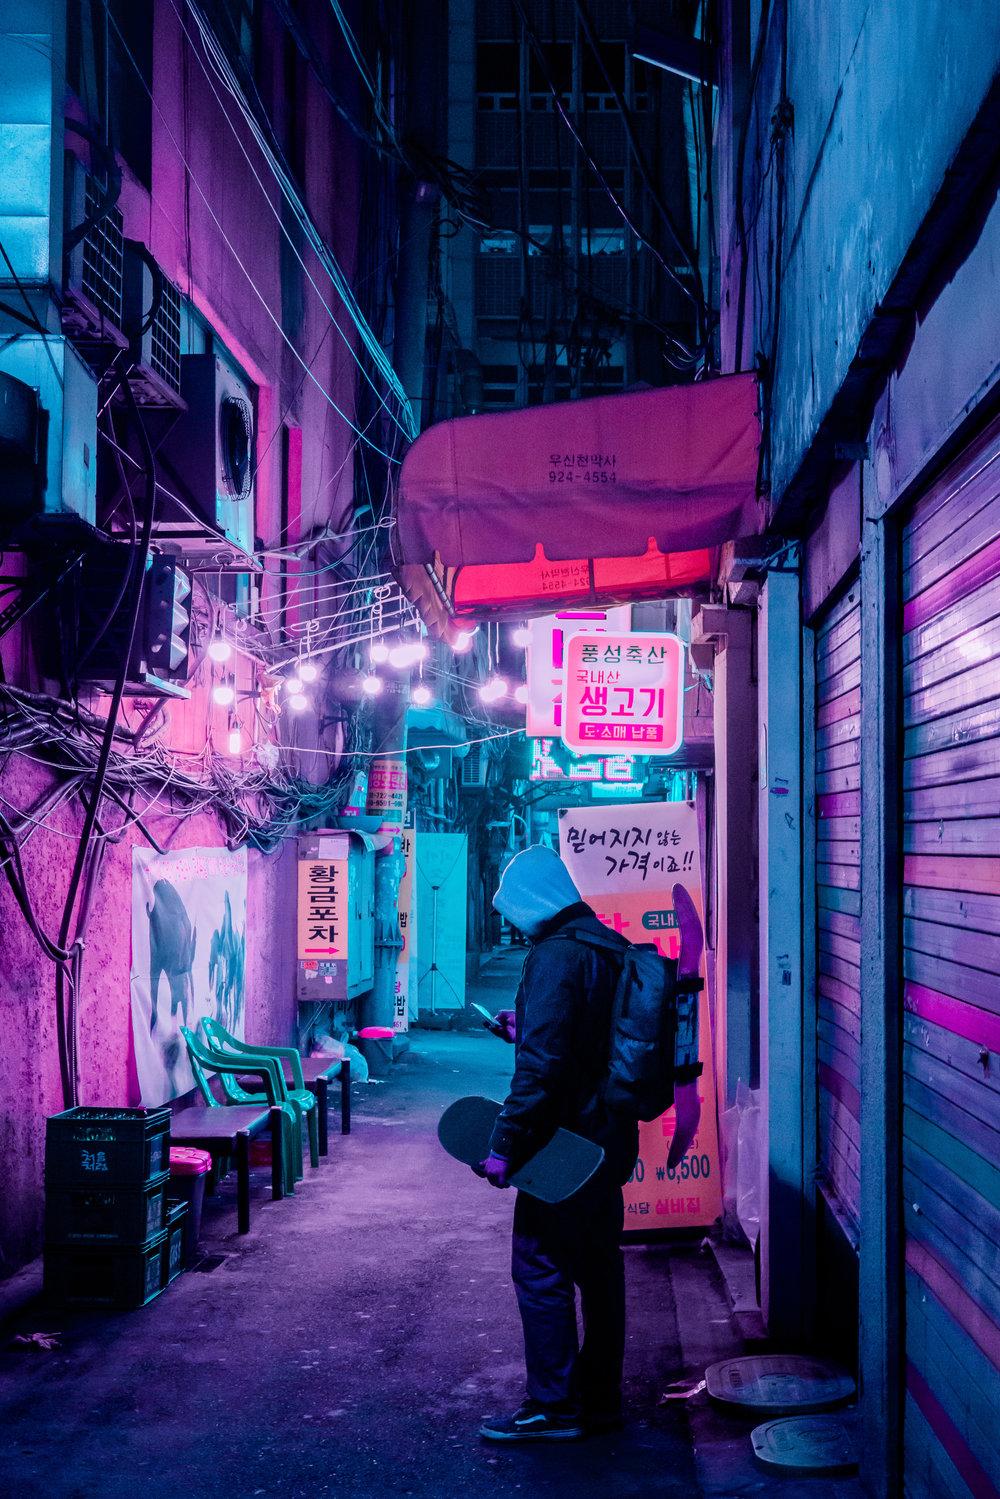 March 2018 - Seoul, South Korea